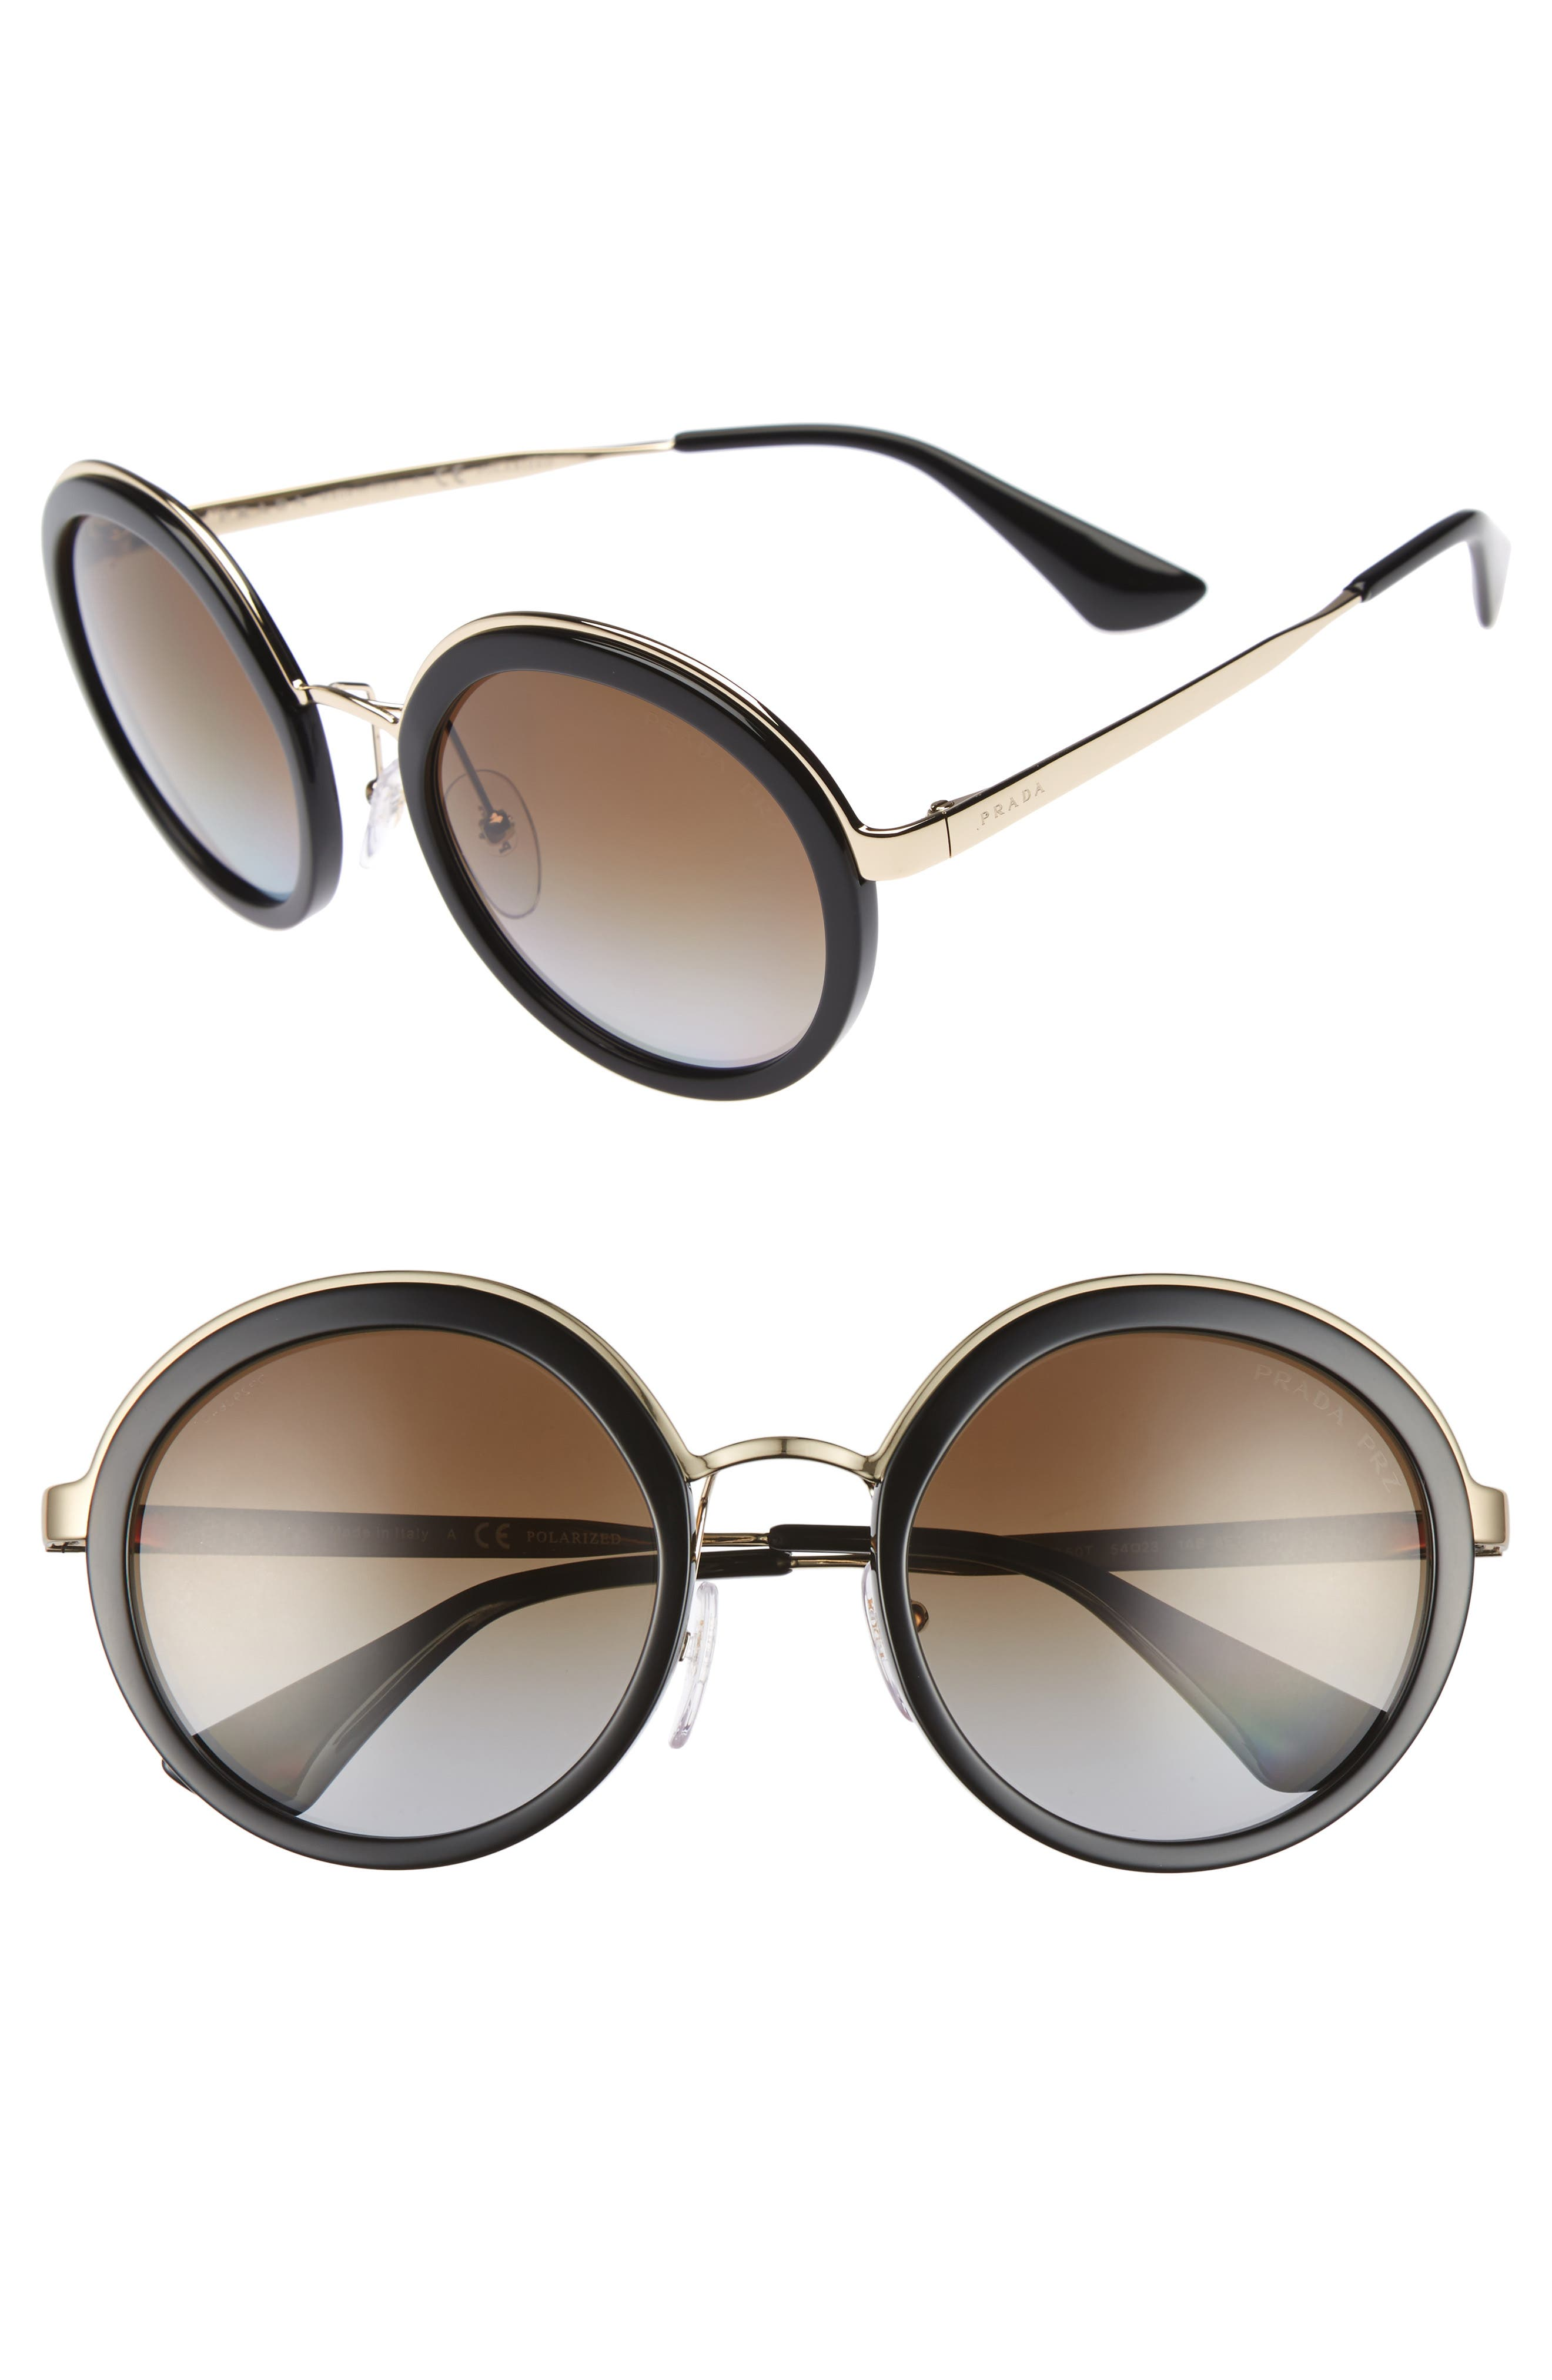 Main Image - Prada 54mm Polarized Round Sunglasses